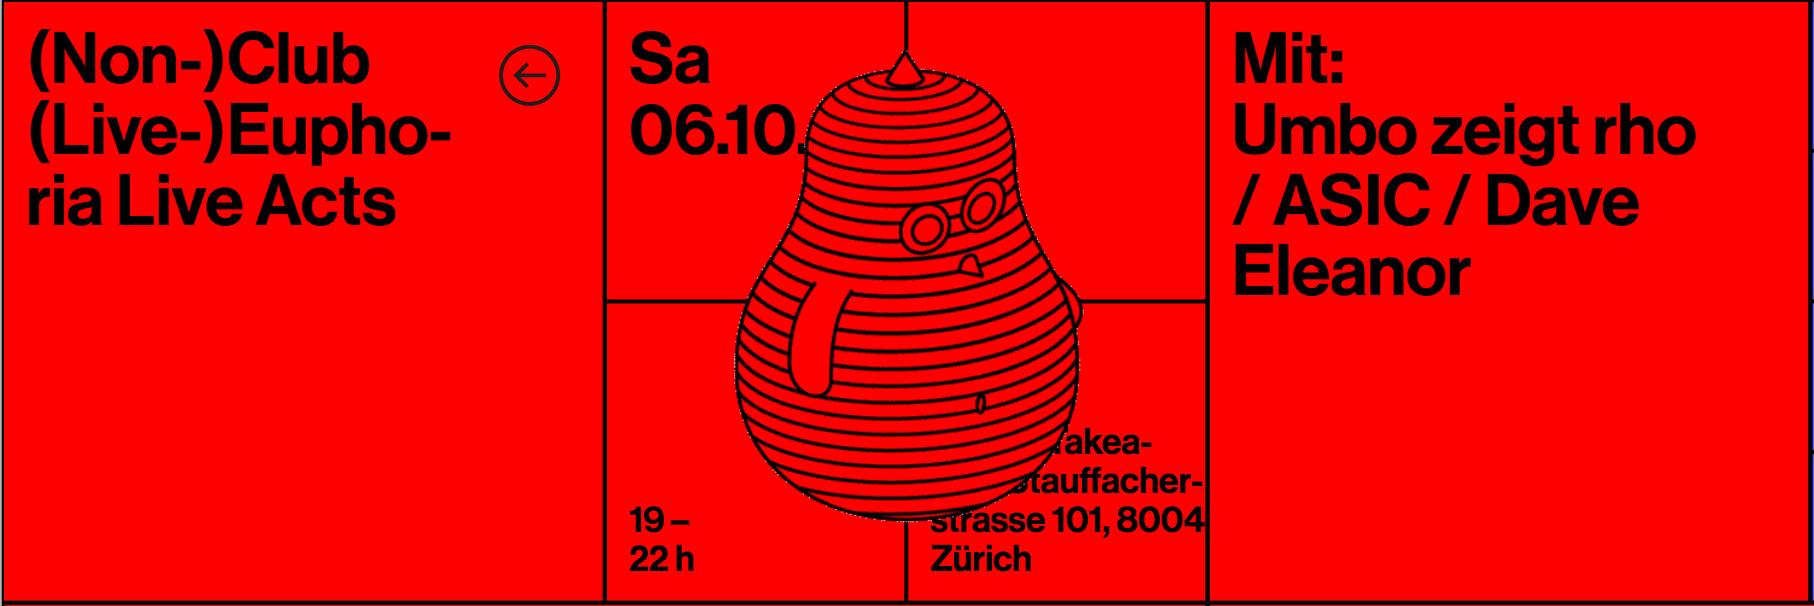 (Non-)Club, (Live-)Euphoria @ 20 Jahre Kulturbüro